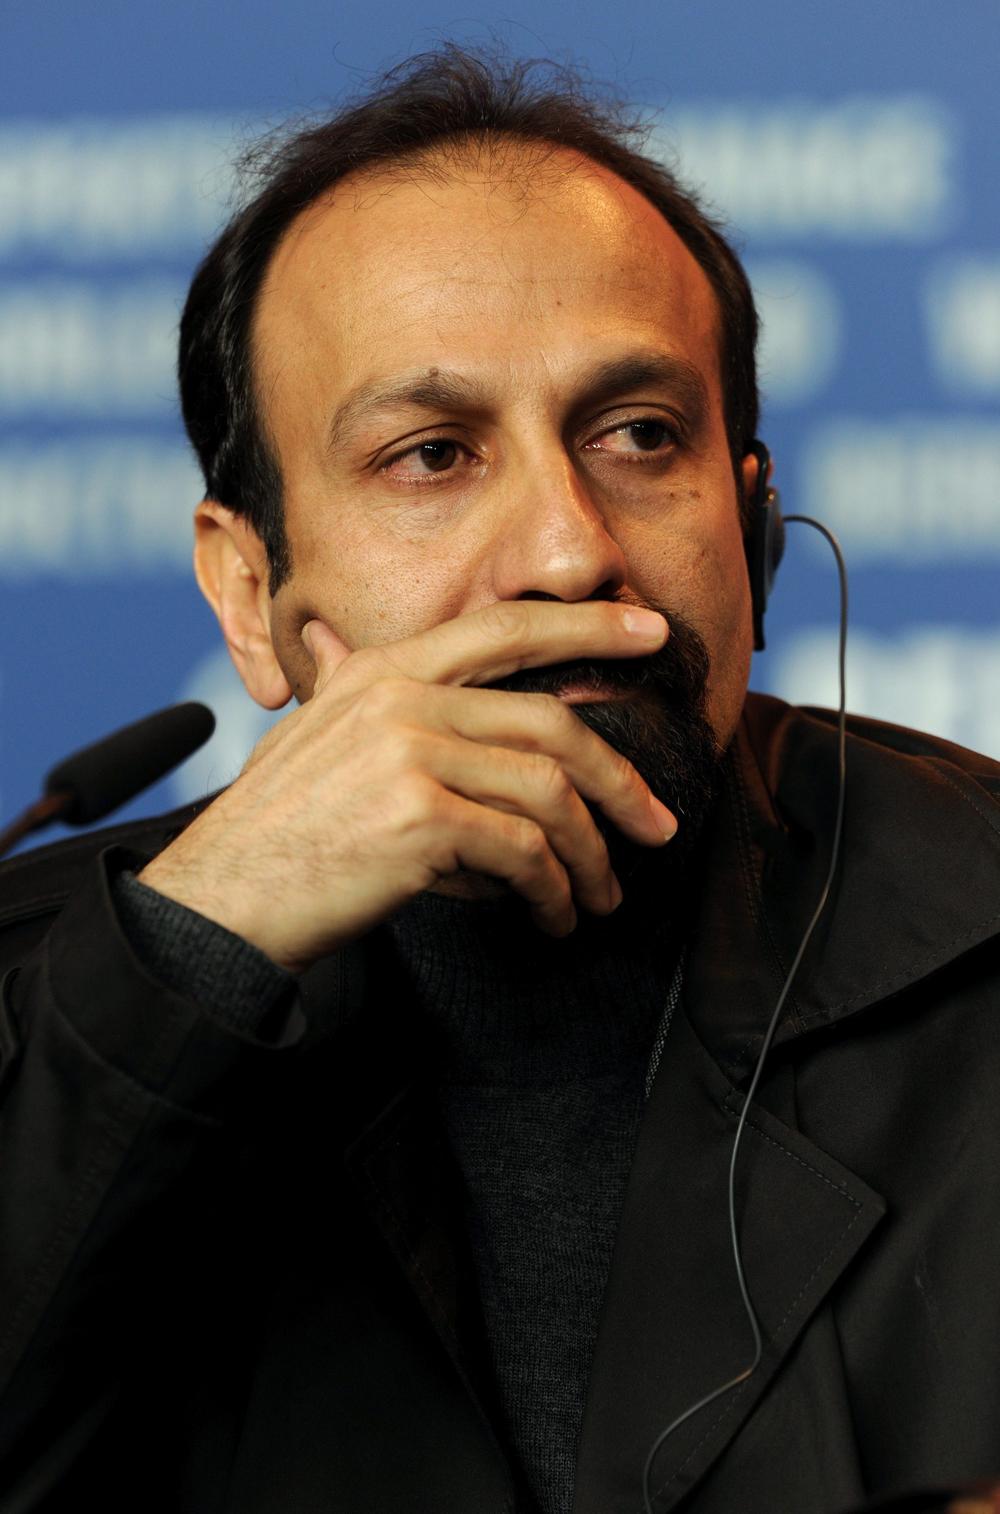 In foto Asghar Farhadi (46 anni)